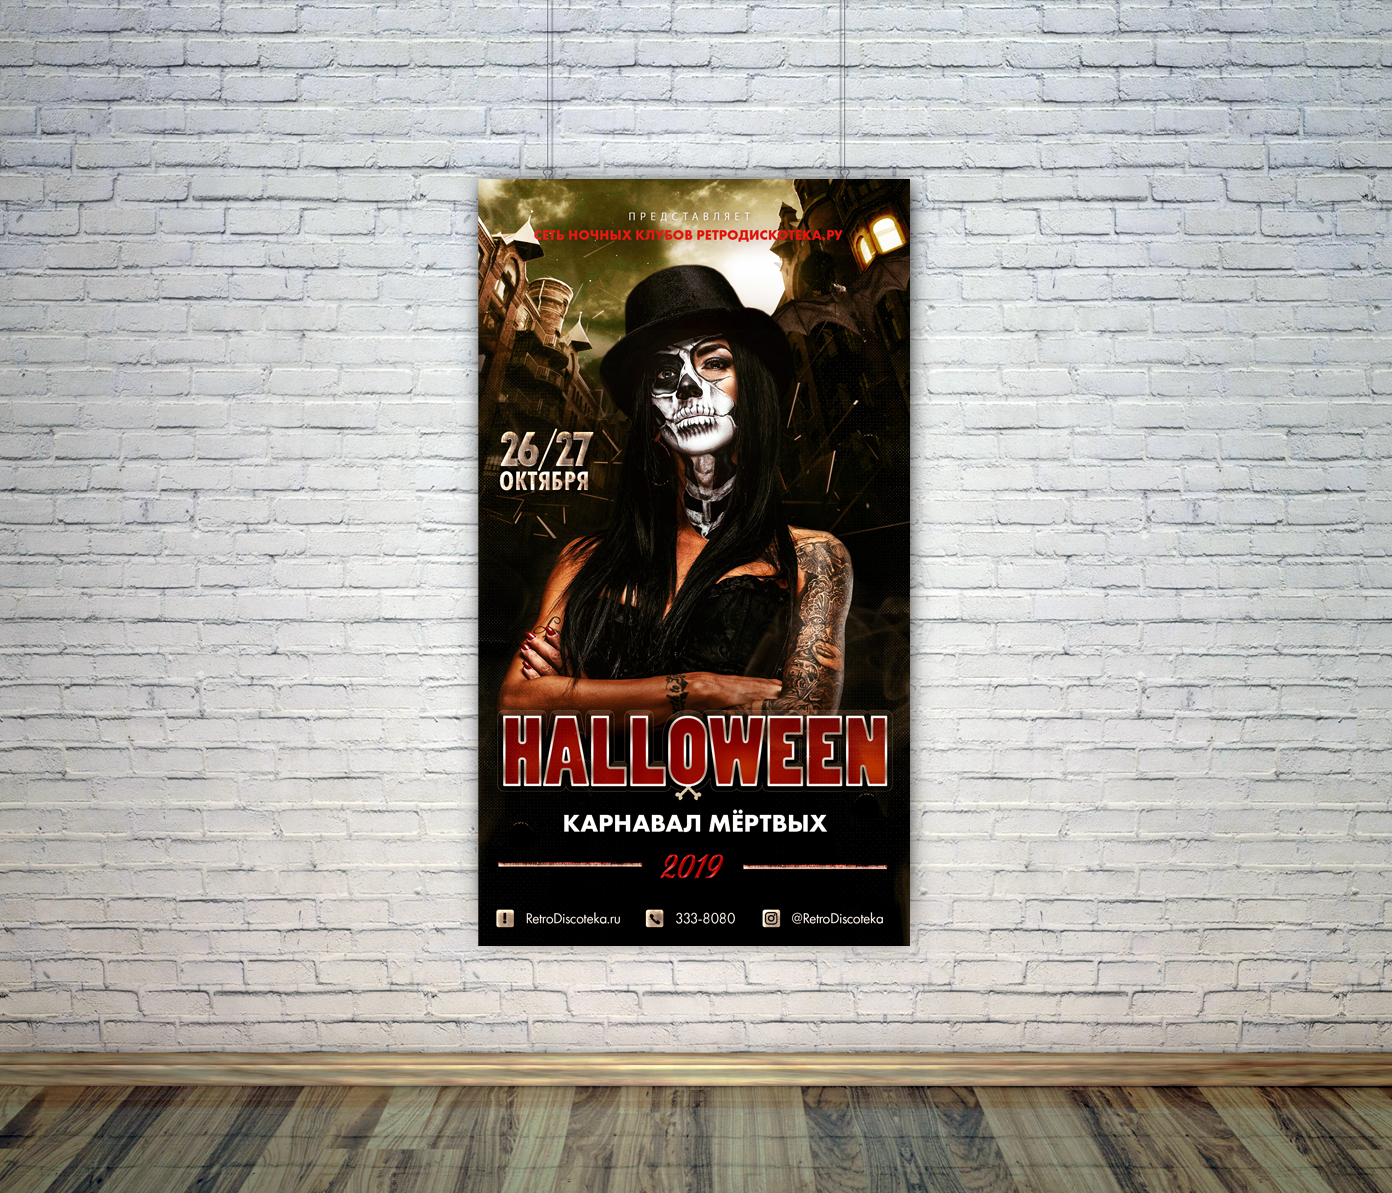 Дизайн афиши Хэллоуин 2019 для сети ночных клубов фото f_4975c6ea4acba65e.jpg